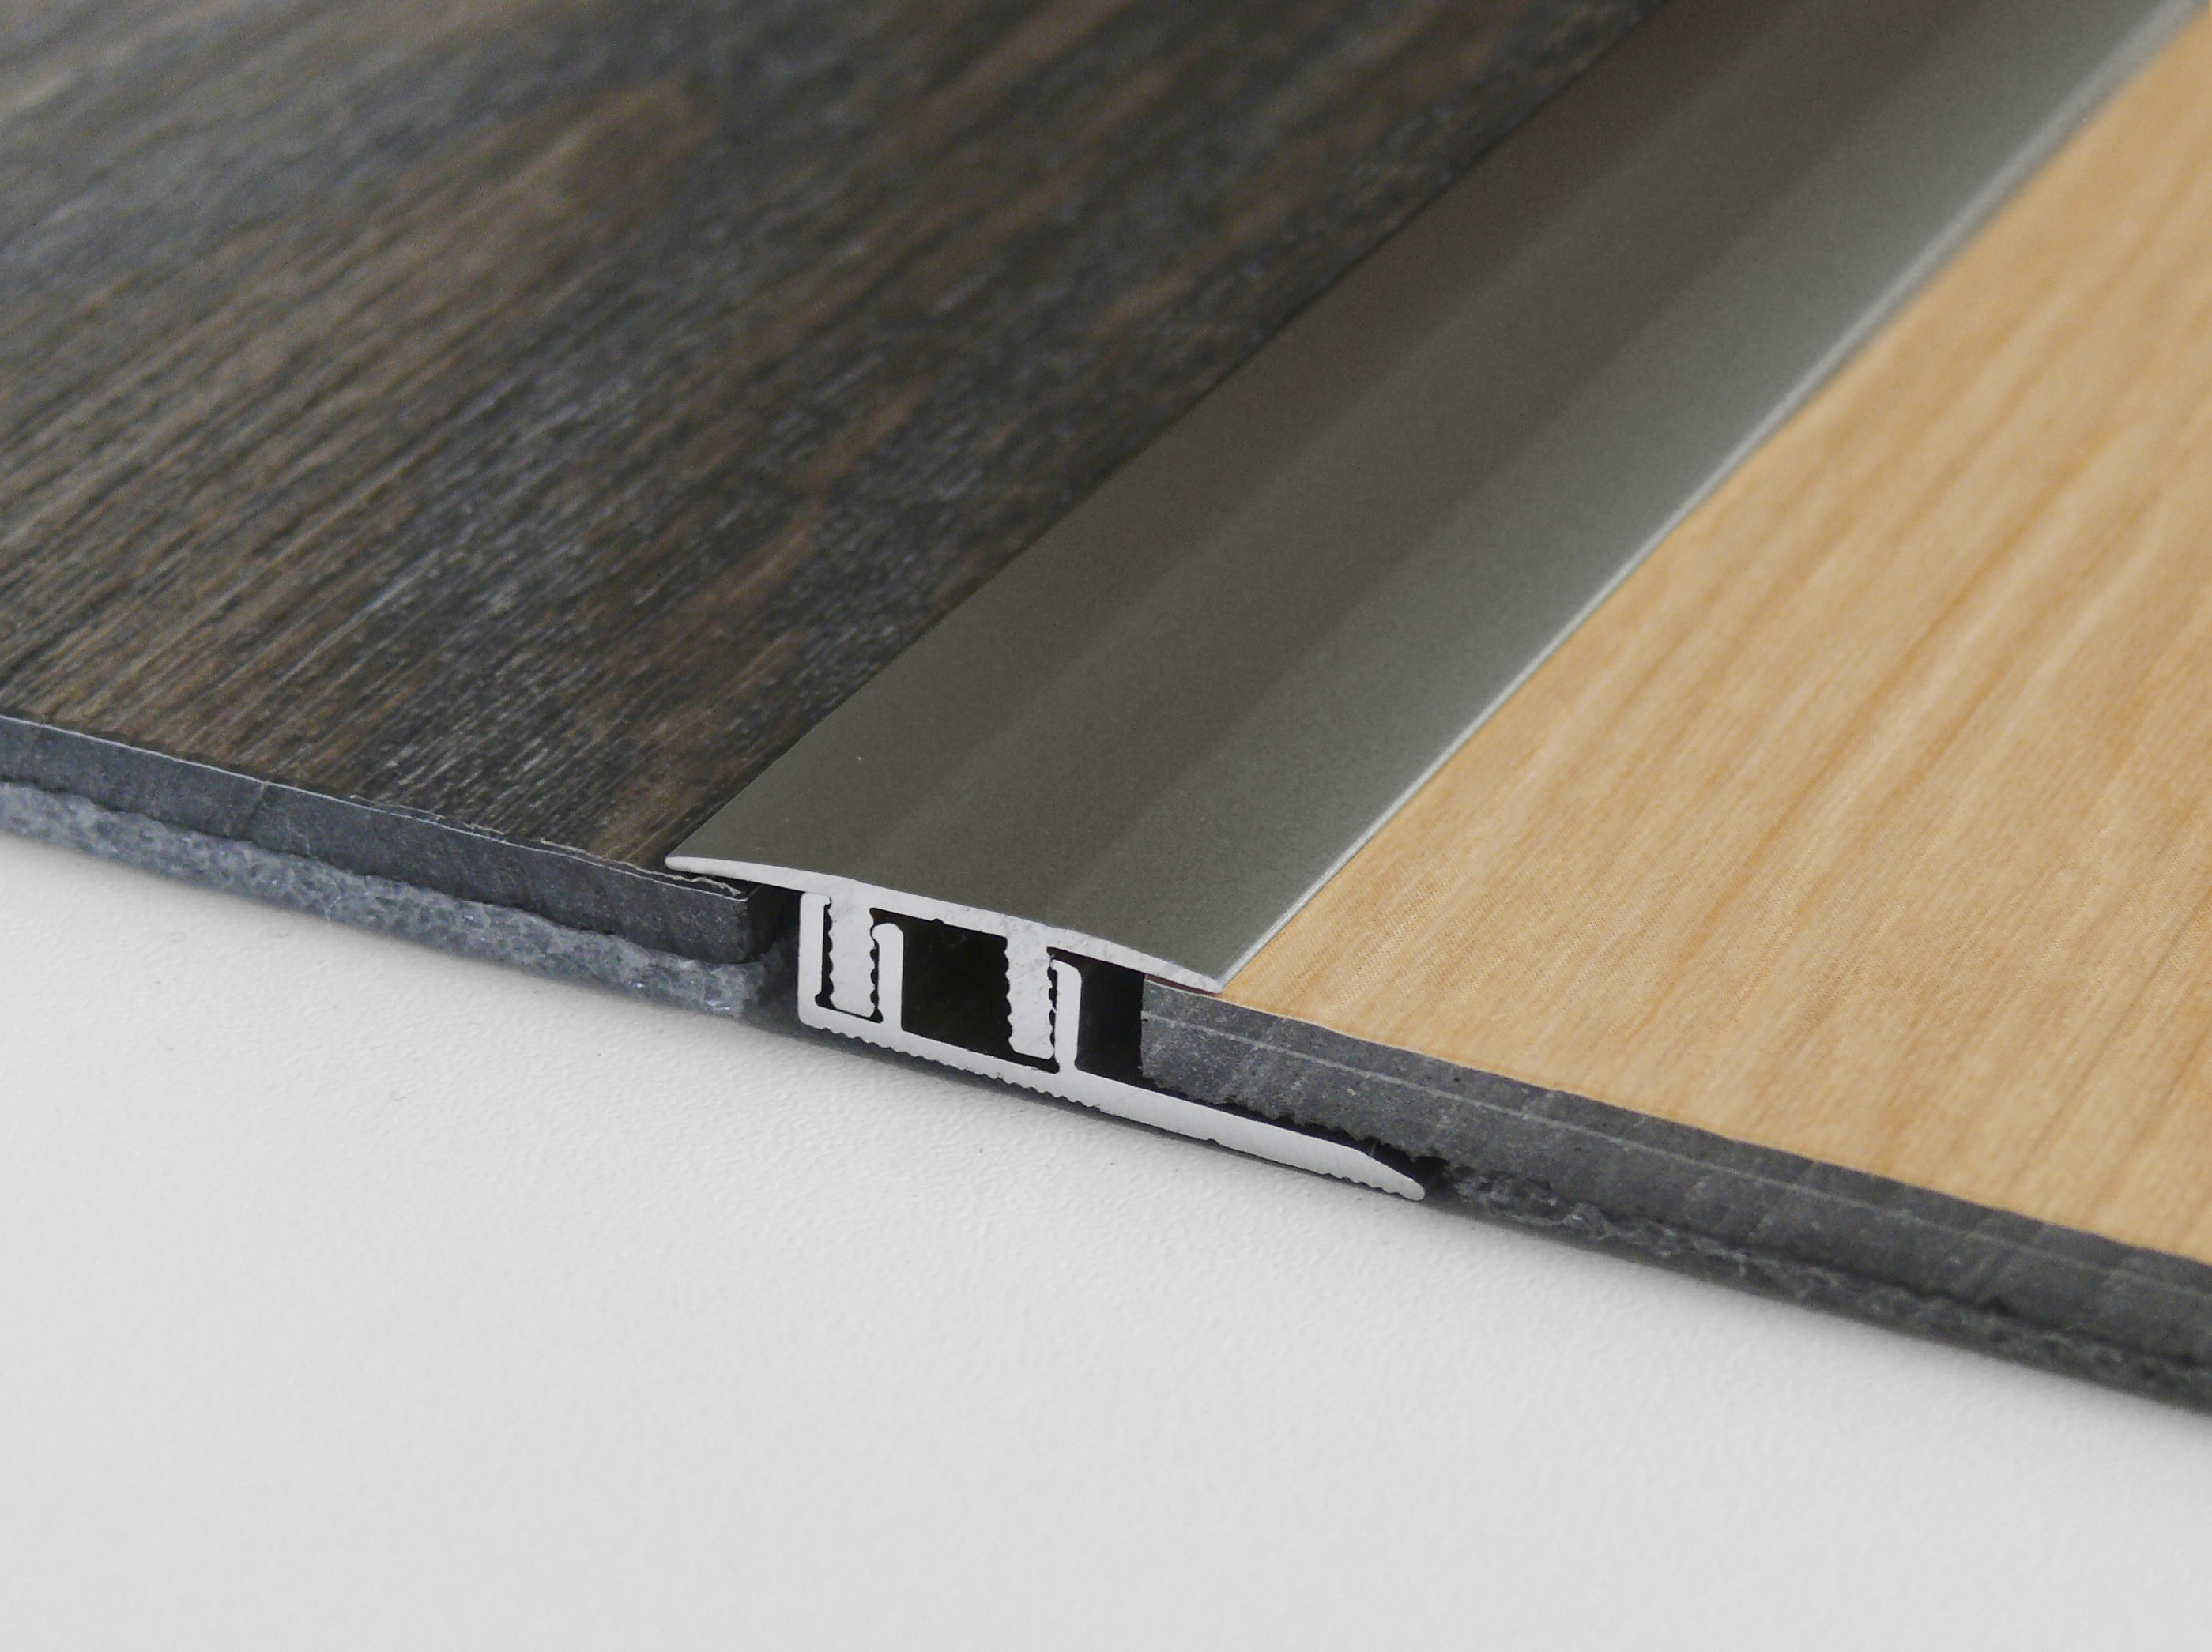 bewegungsprofil solid pro 2700mm edelstahloptik metallprofile sockelleisten zubeh r. Black Bedroom Furniture Sets. Home Design Ideas